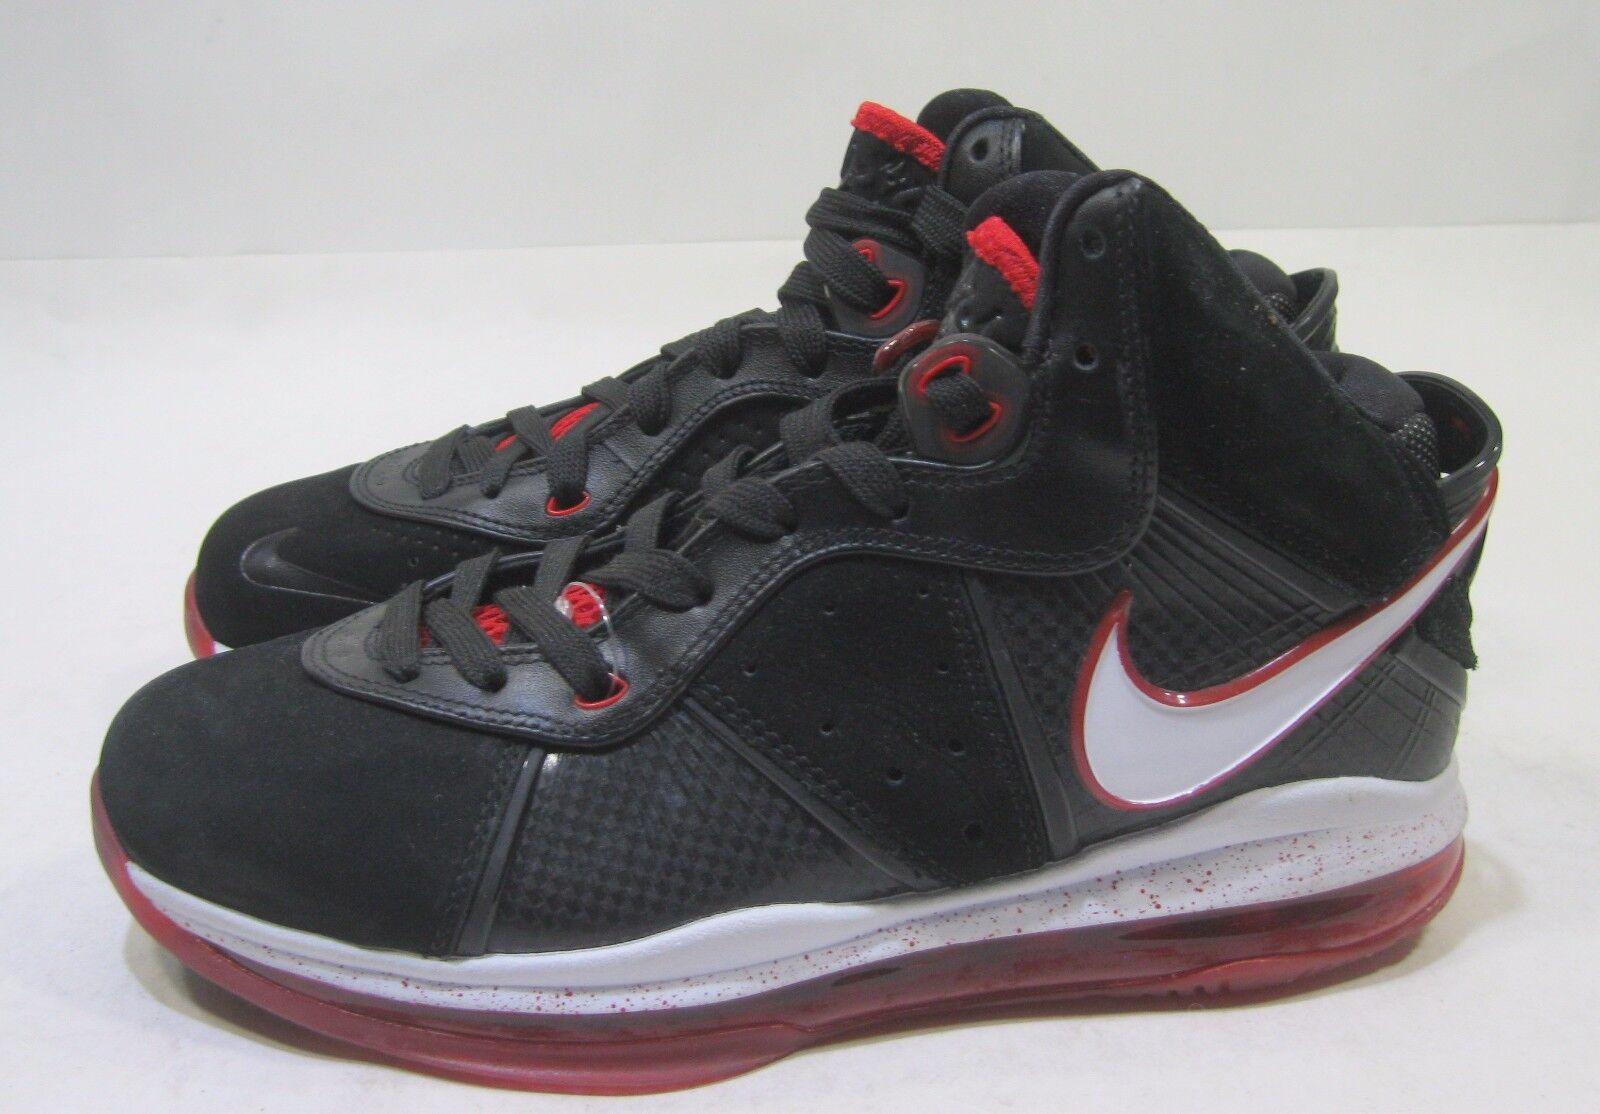 Nike Lebron 8 White-Sport 417098 002 2010 Black, White-Sport 8 Red-Metallic Gold Size 7.5 b7b637